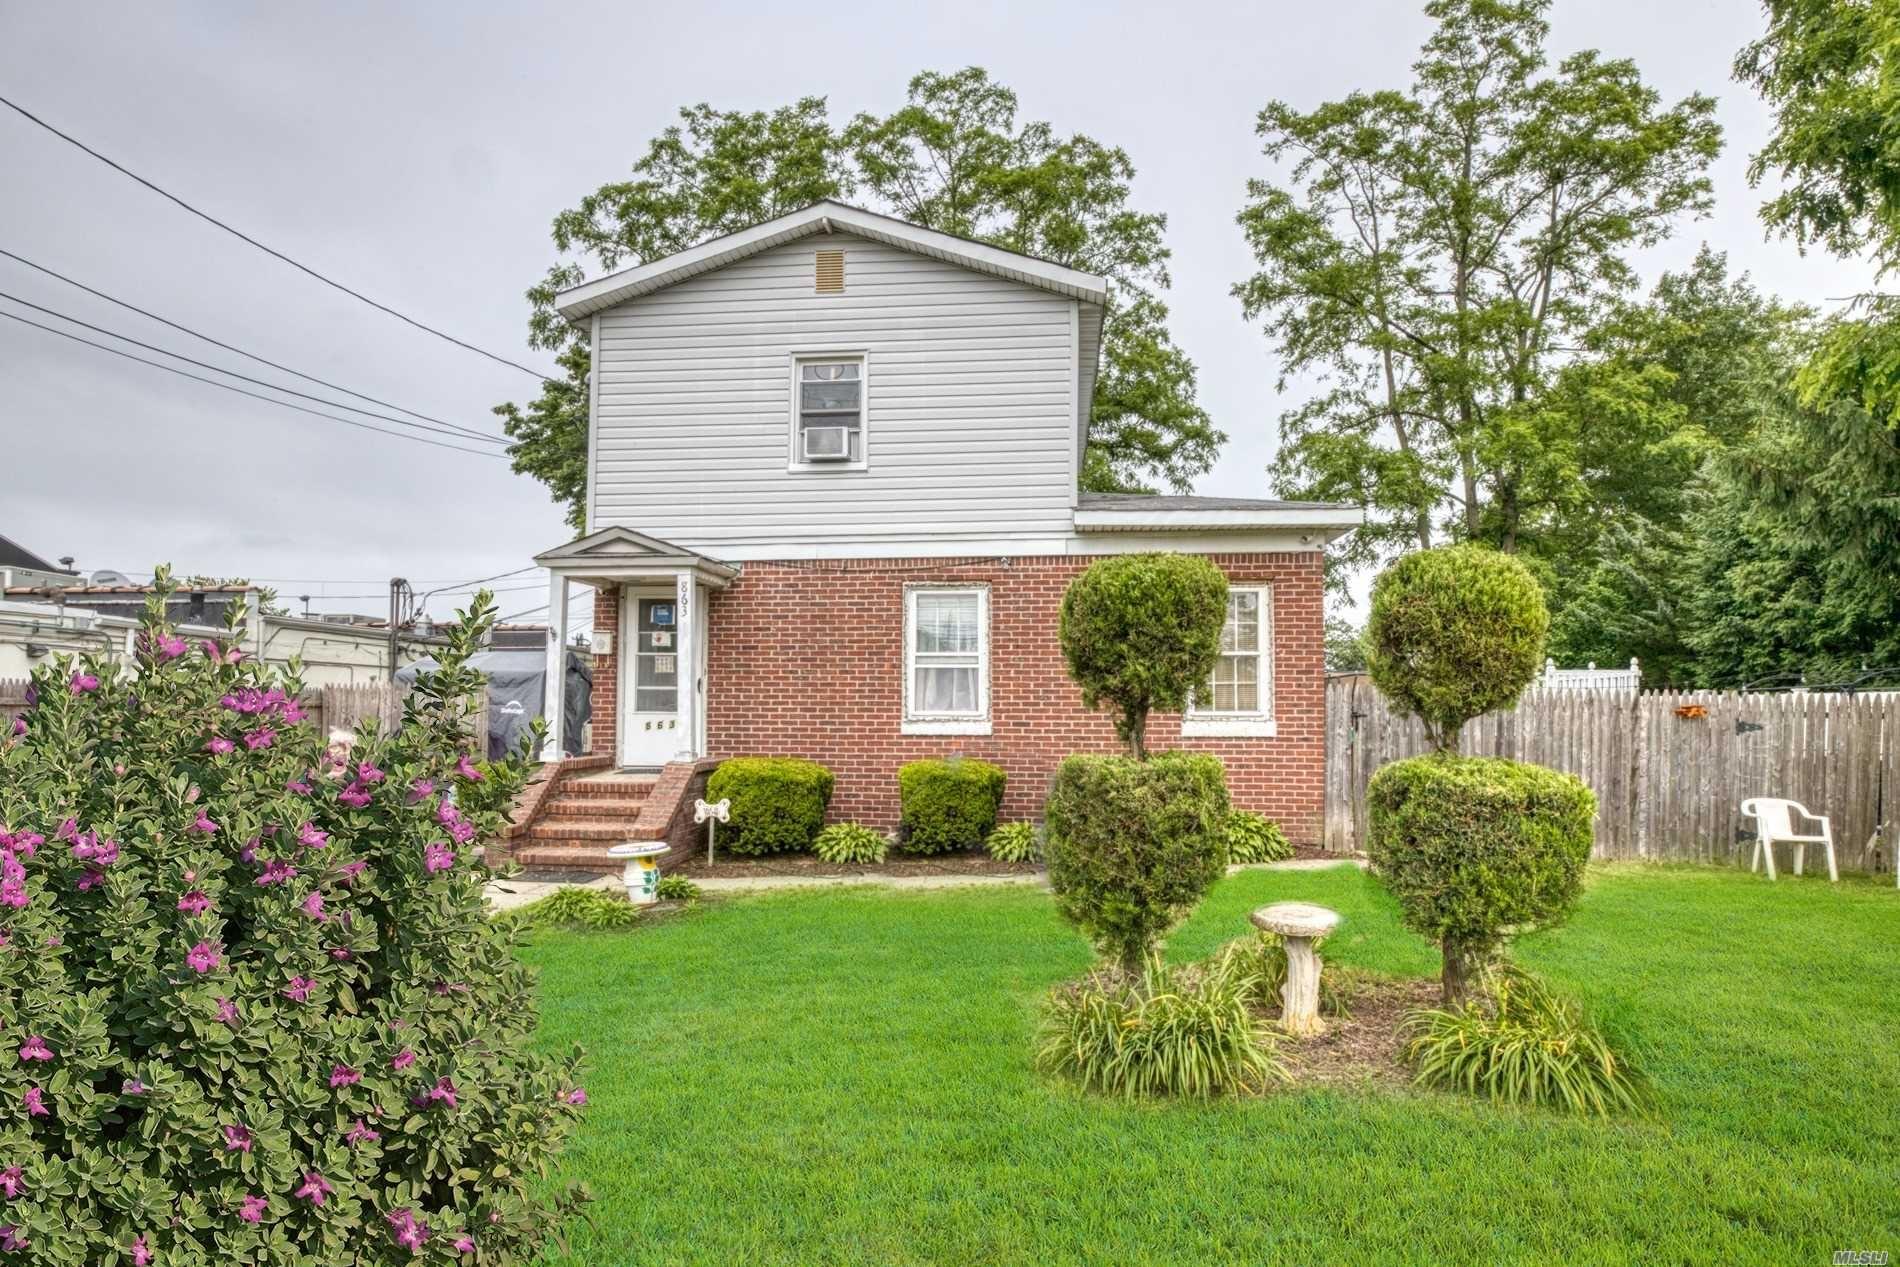 863 Keith Lane, West Islip, NY 11795 - MLS#: 3219875